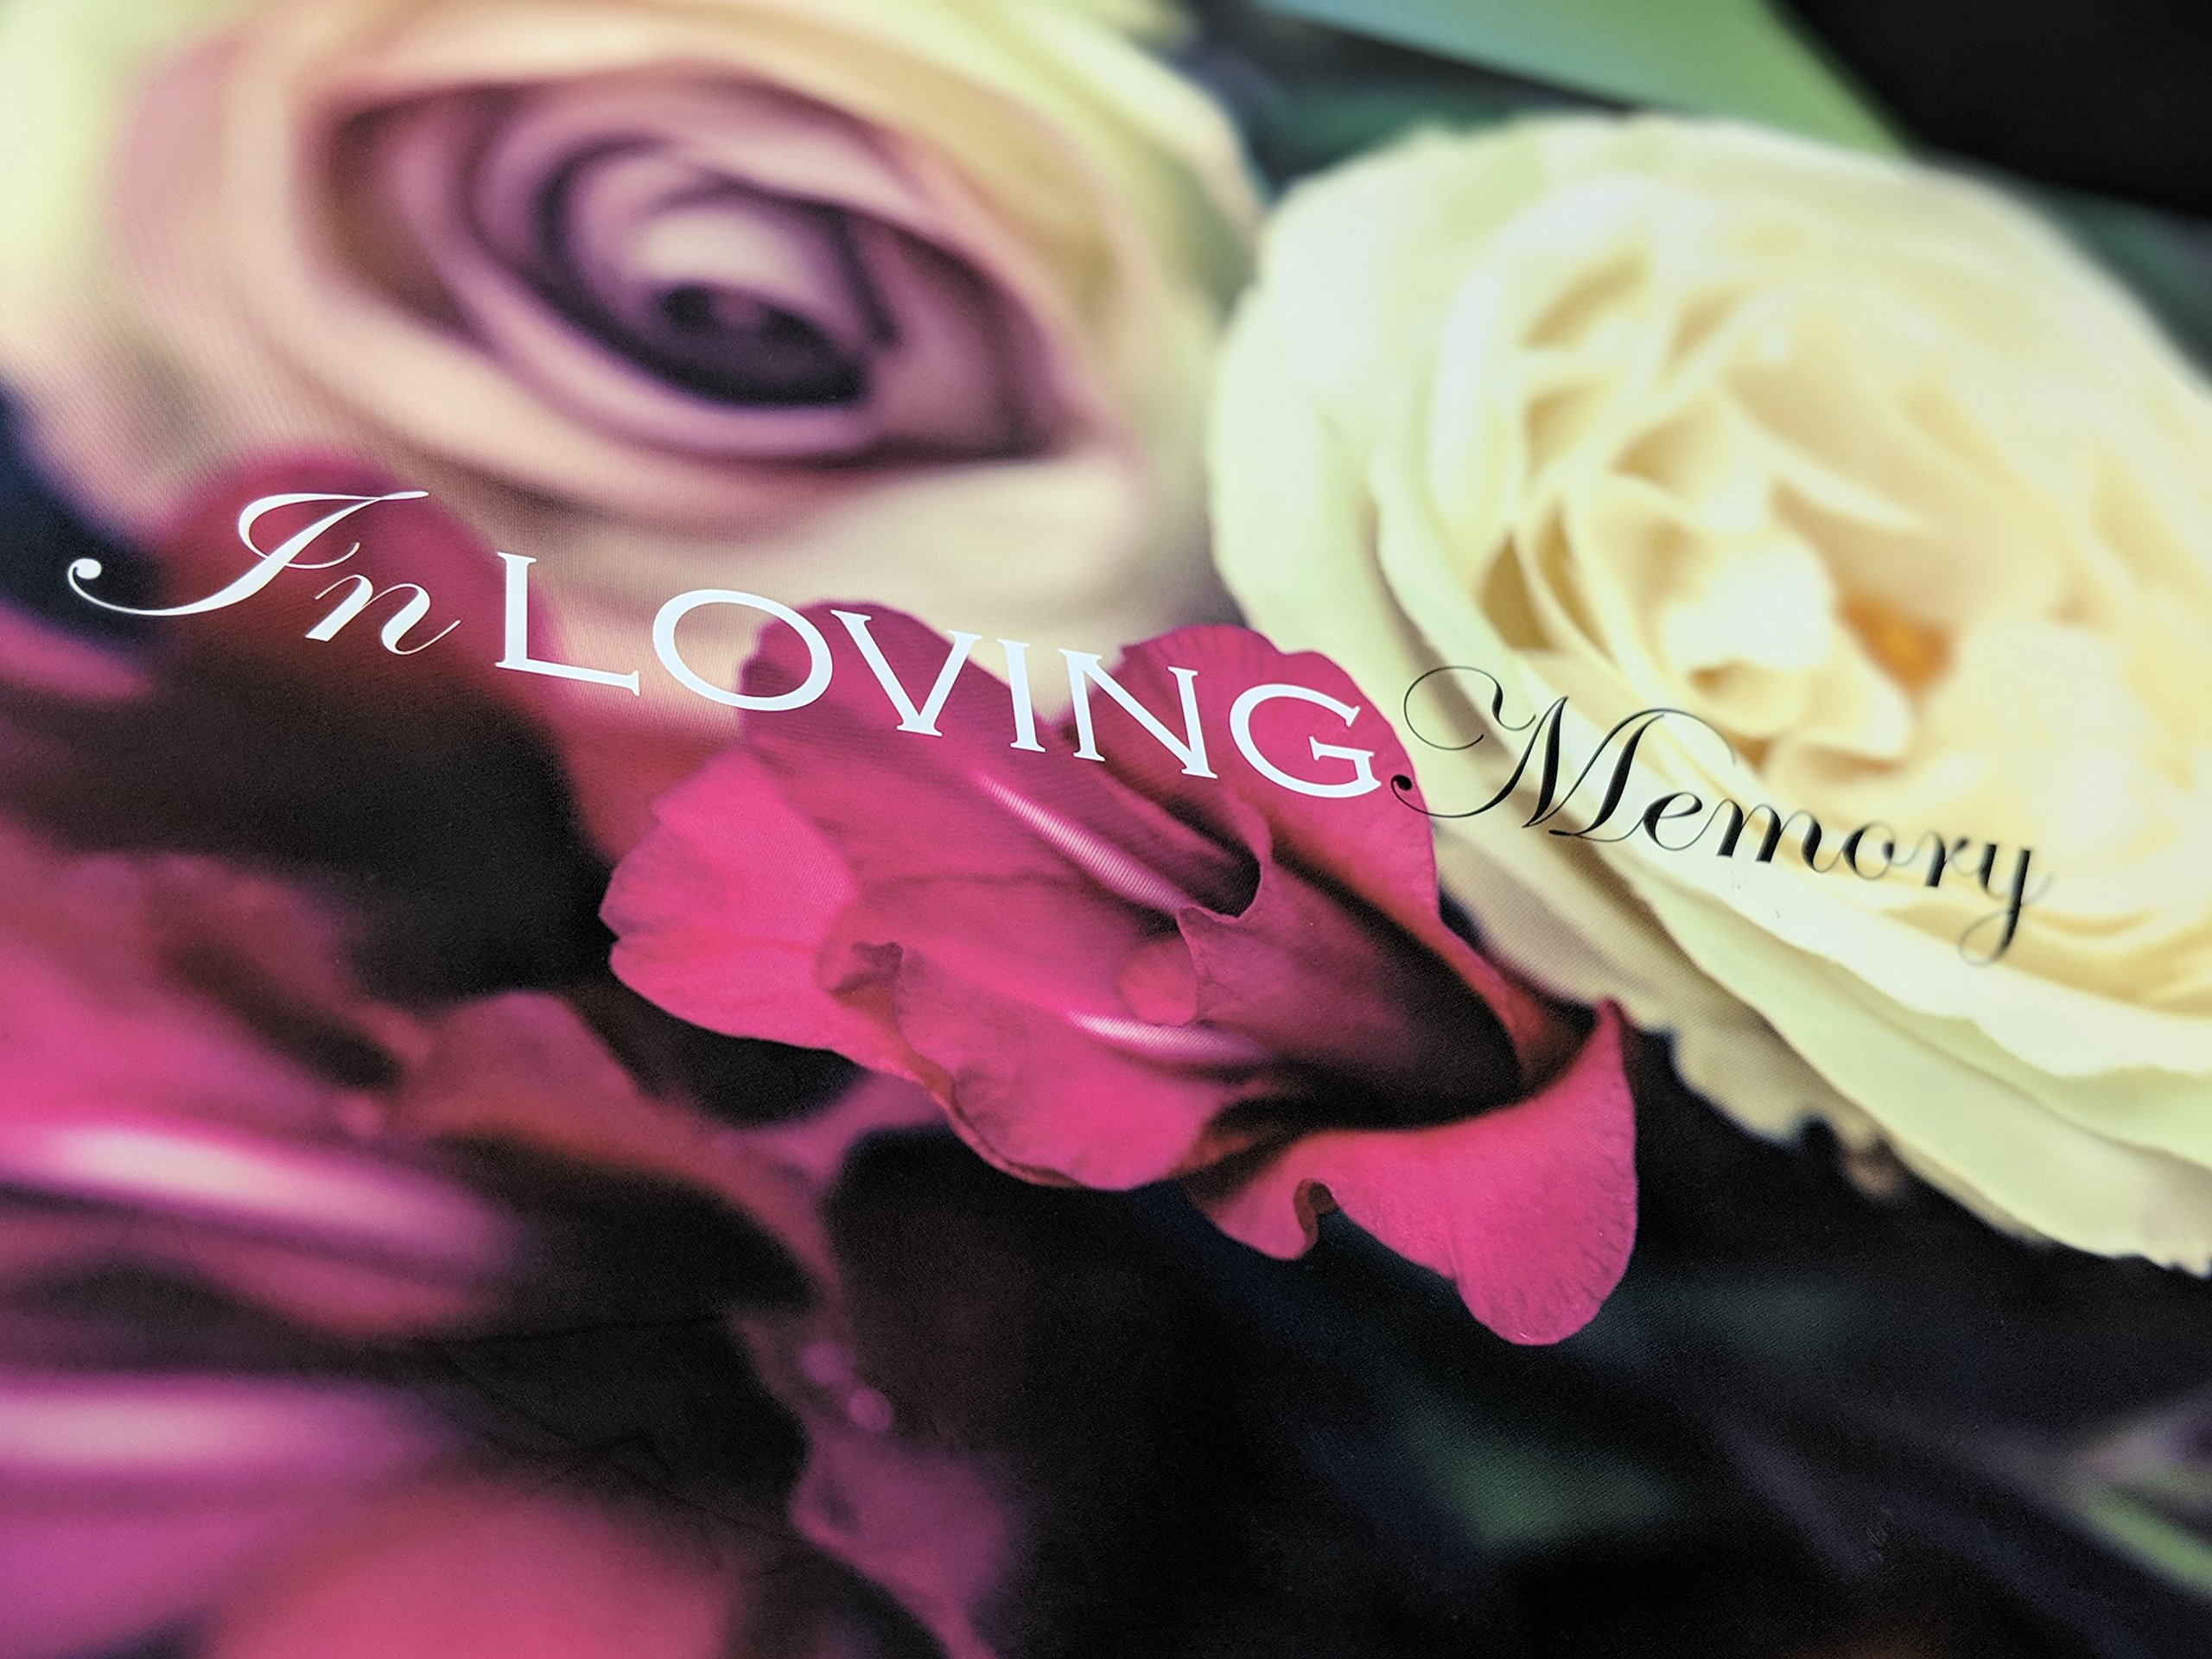 In Loving Memory Funeral Guest Book, Memorial Guest Book, Registration Book, Condolence Book, Remembrance Book, Contemporary Matte Finish, Hard Cover